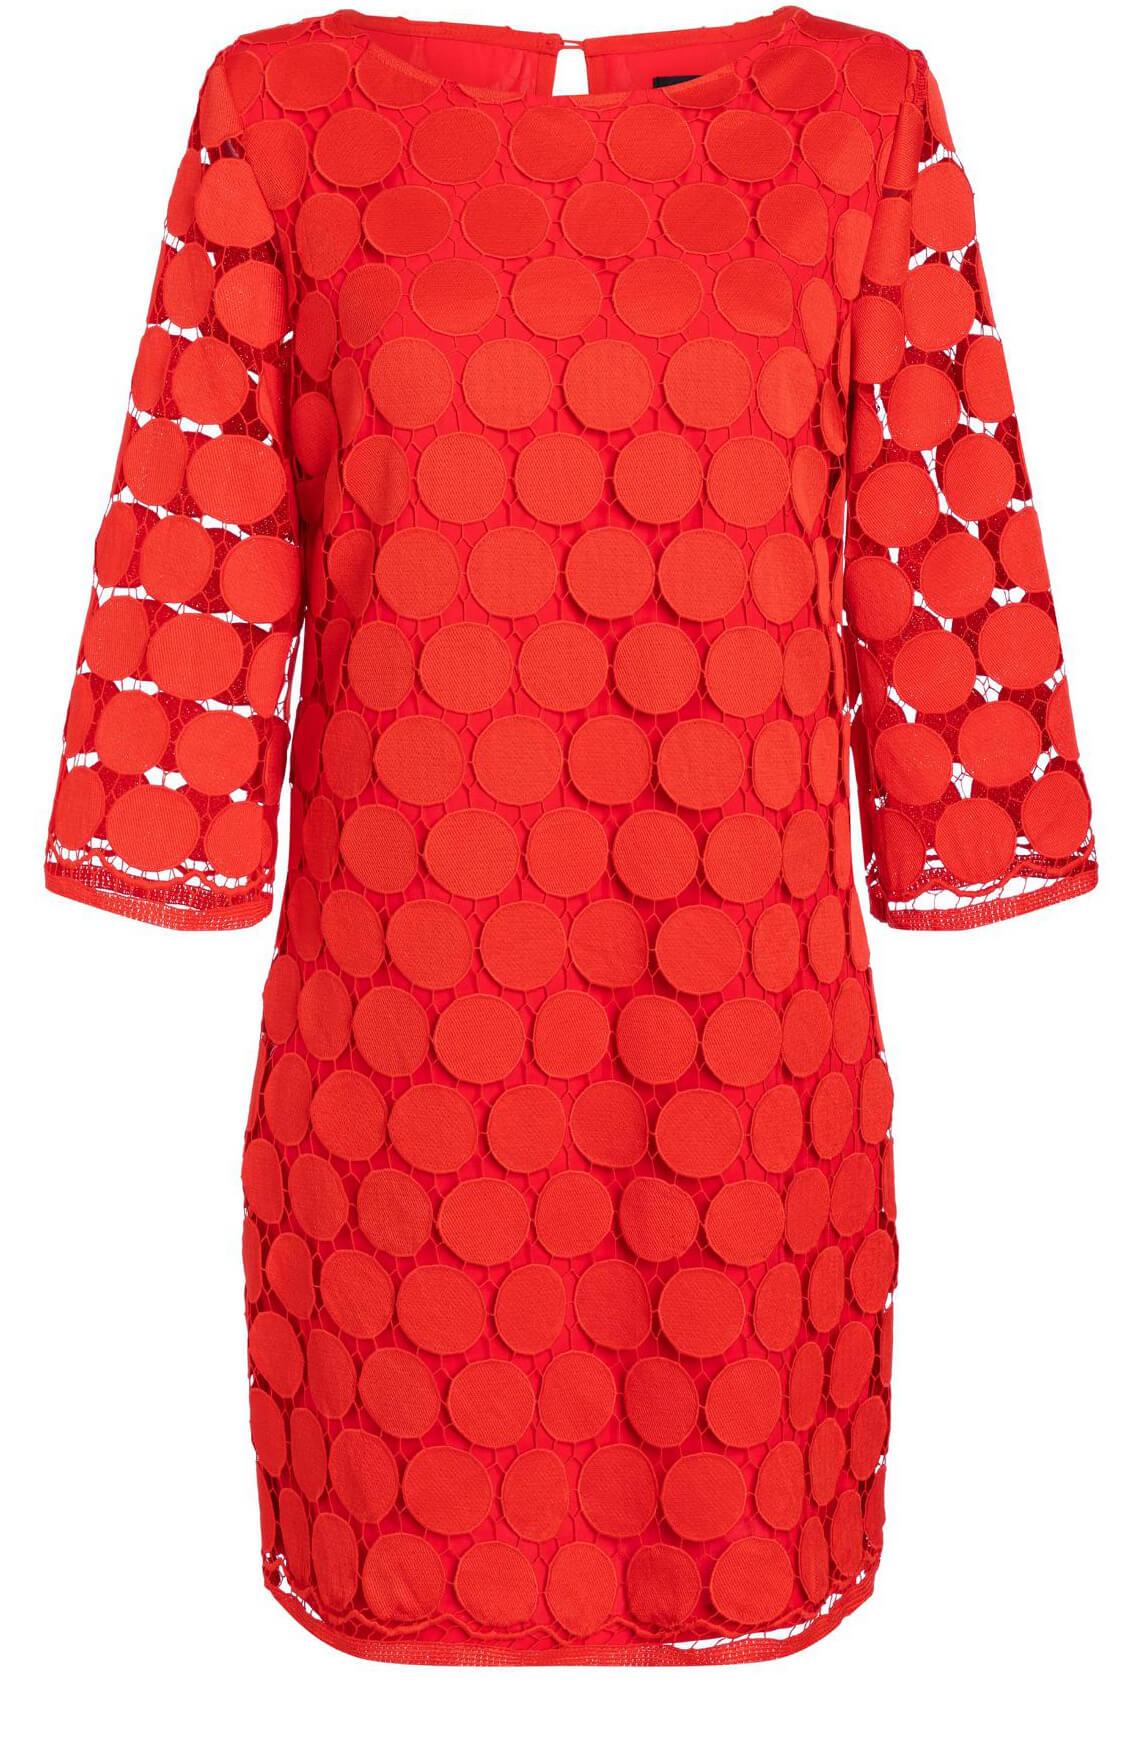 Ana Alcazar Dames Sakola jurk met kant Rood